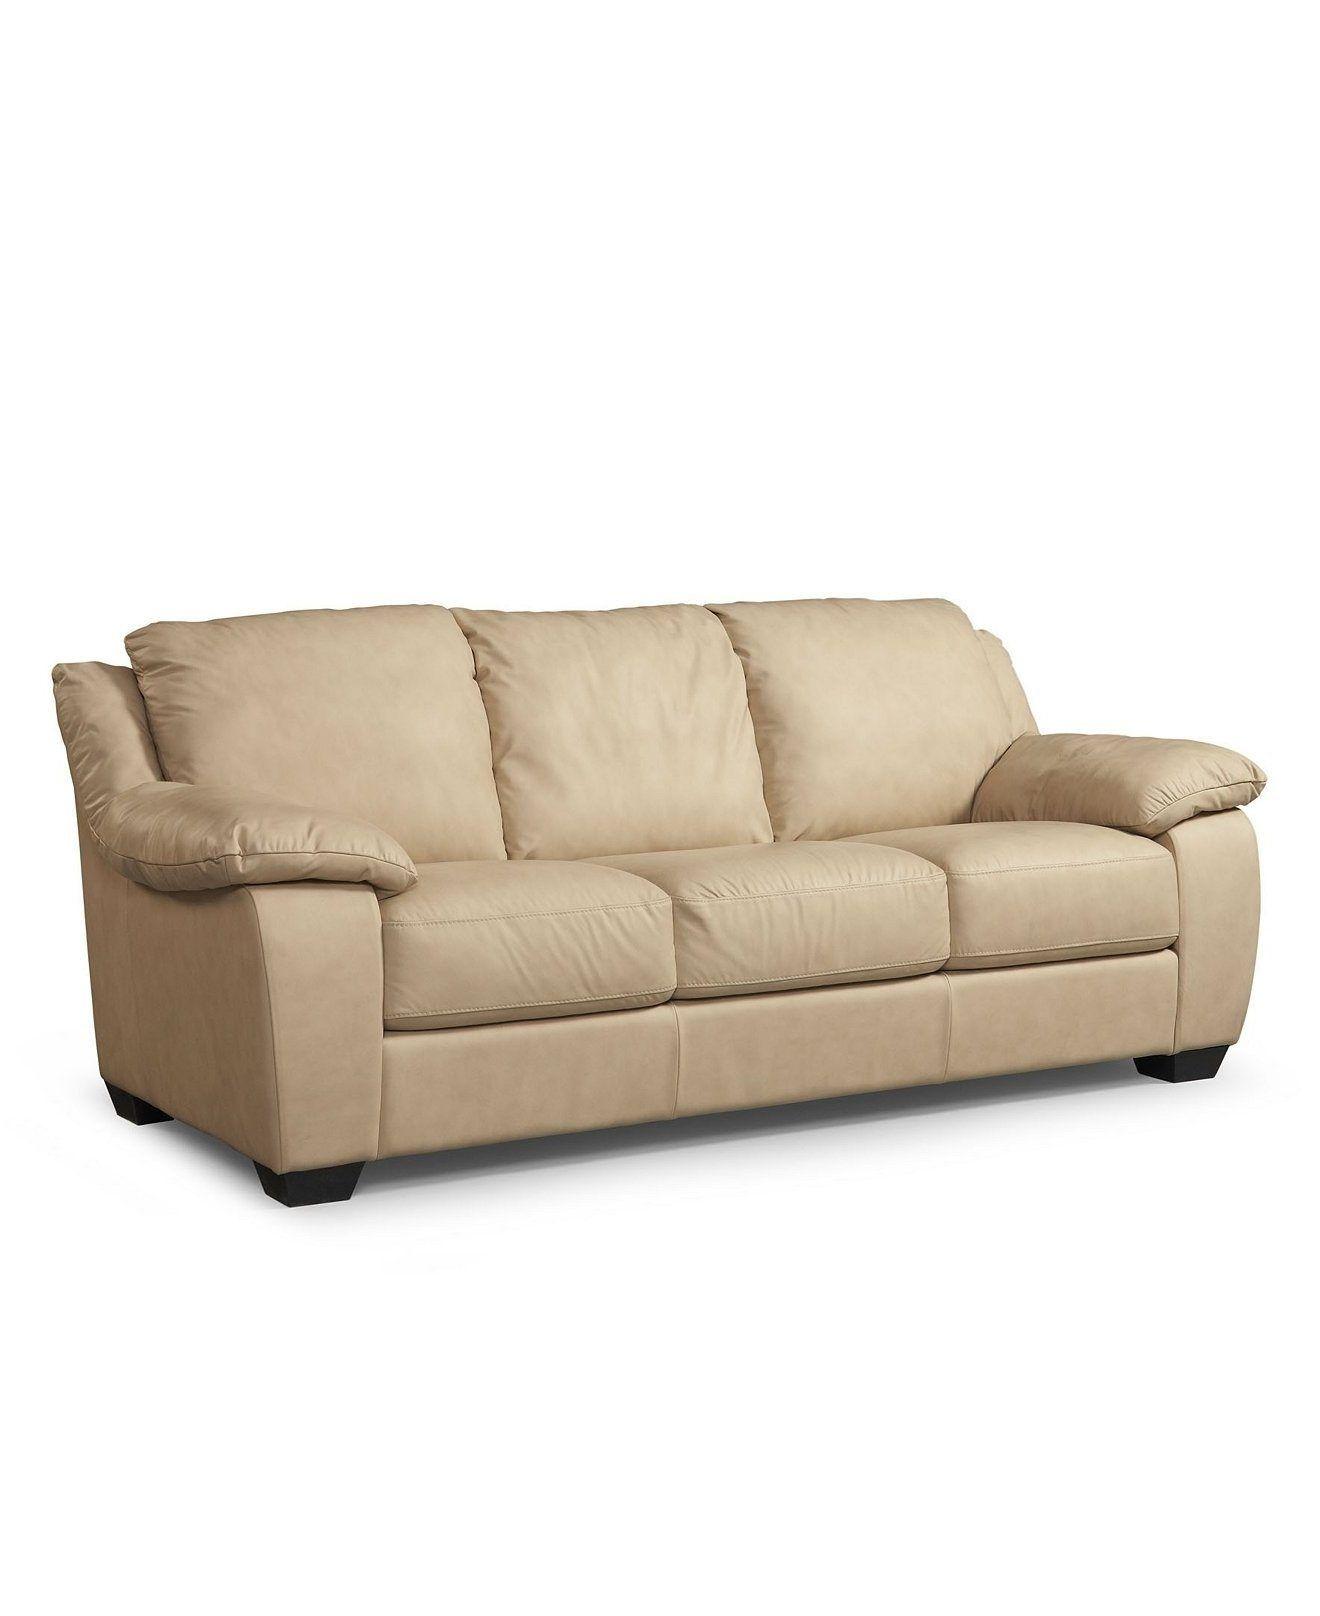 Charmant Blair 86 Leather Sofa